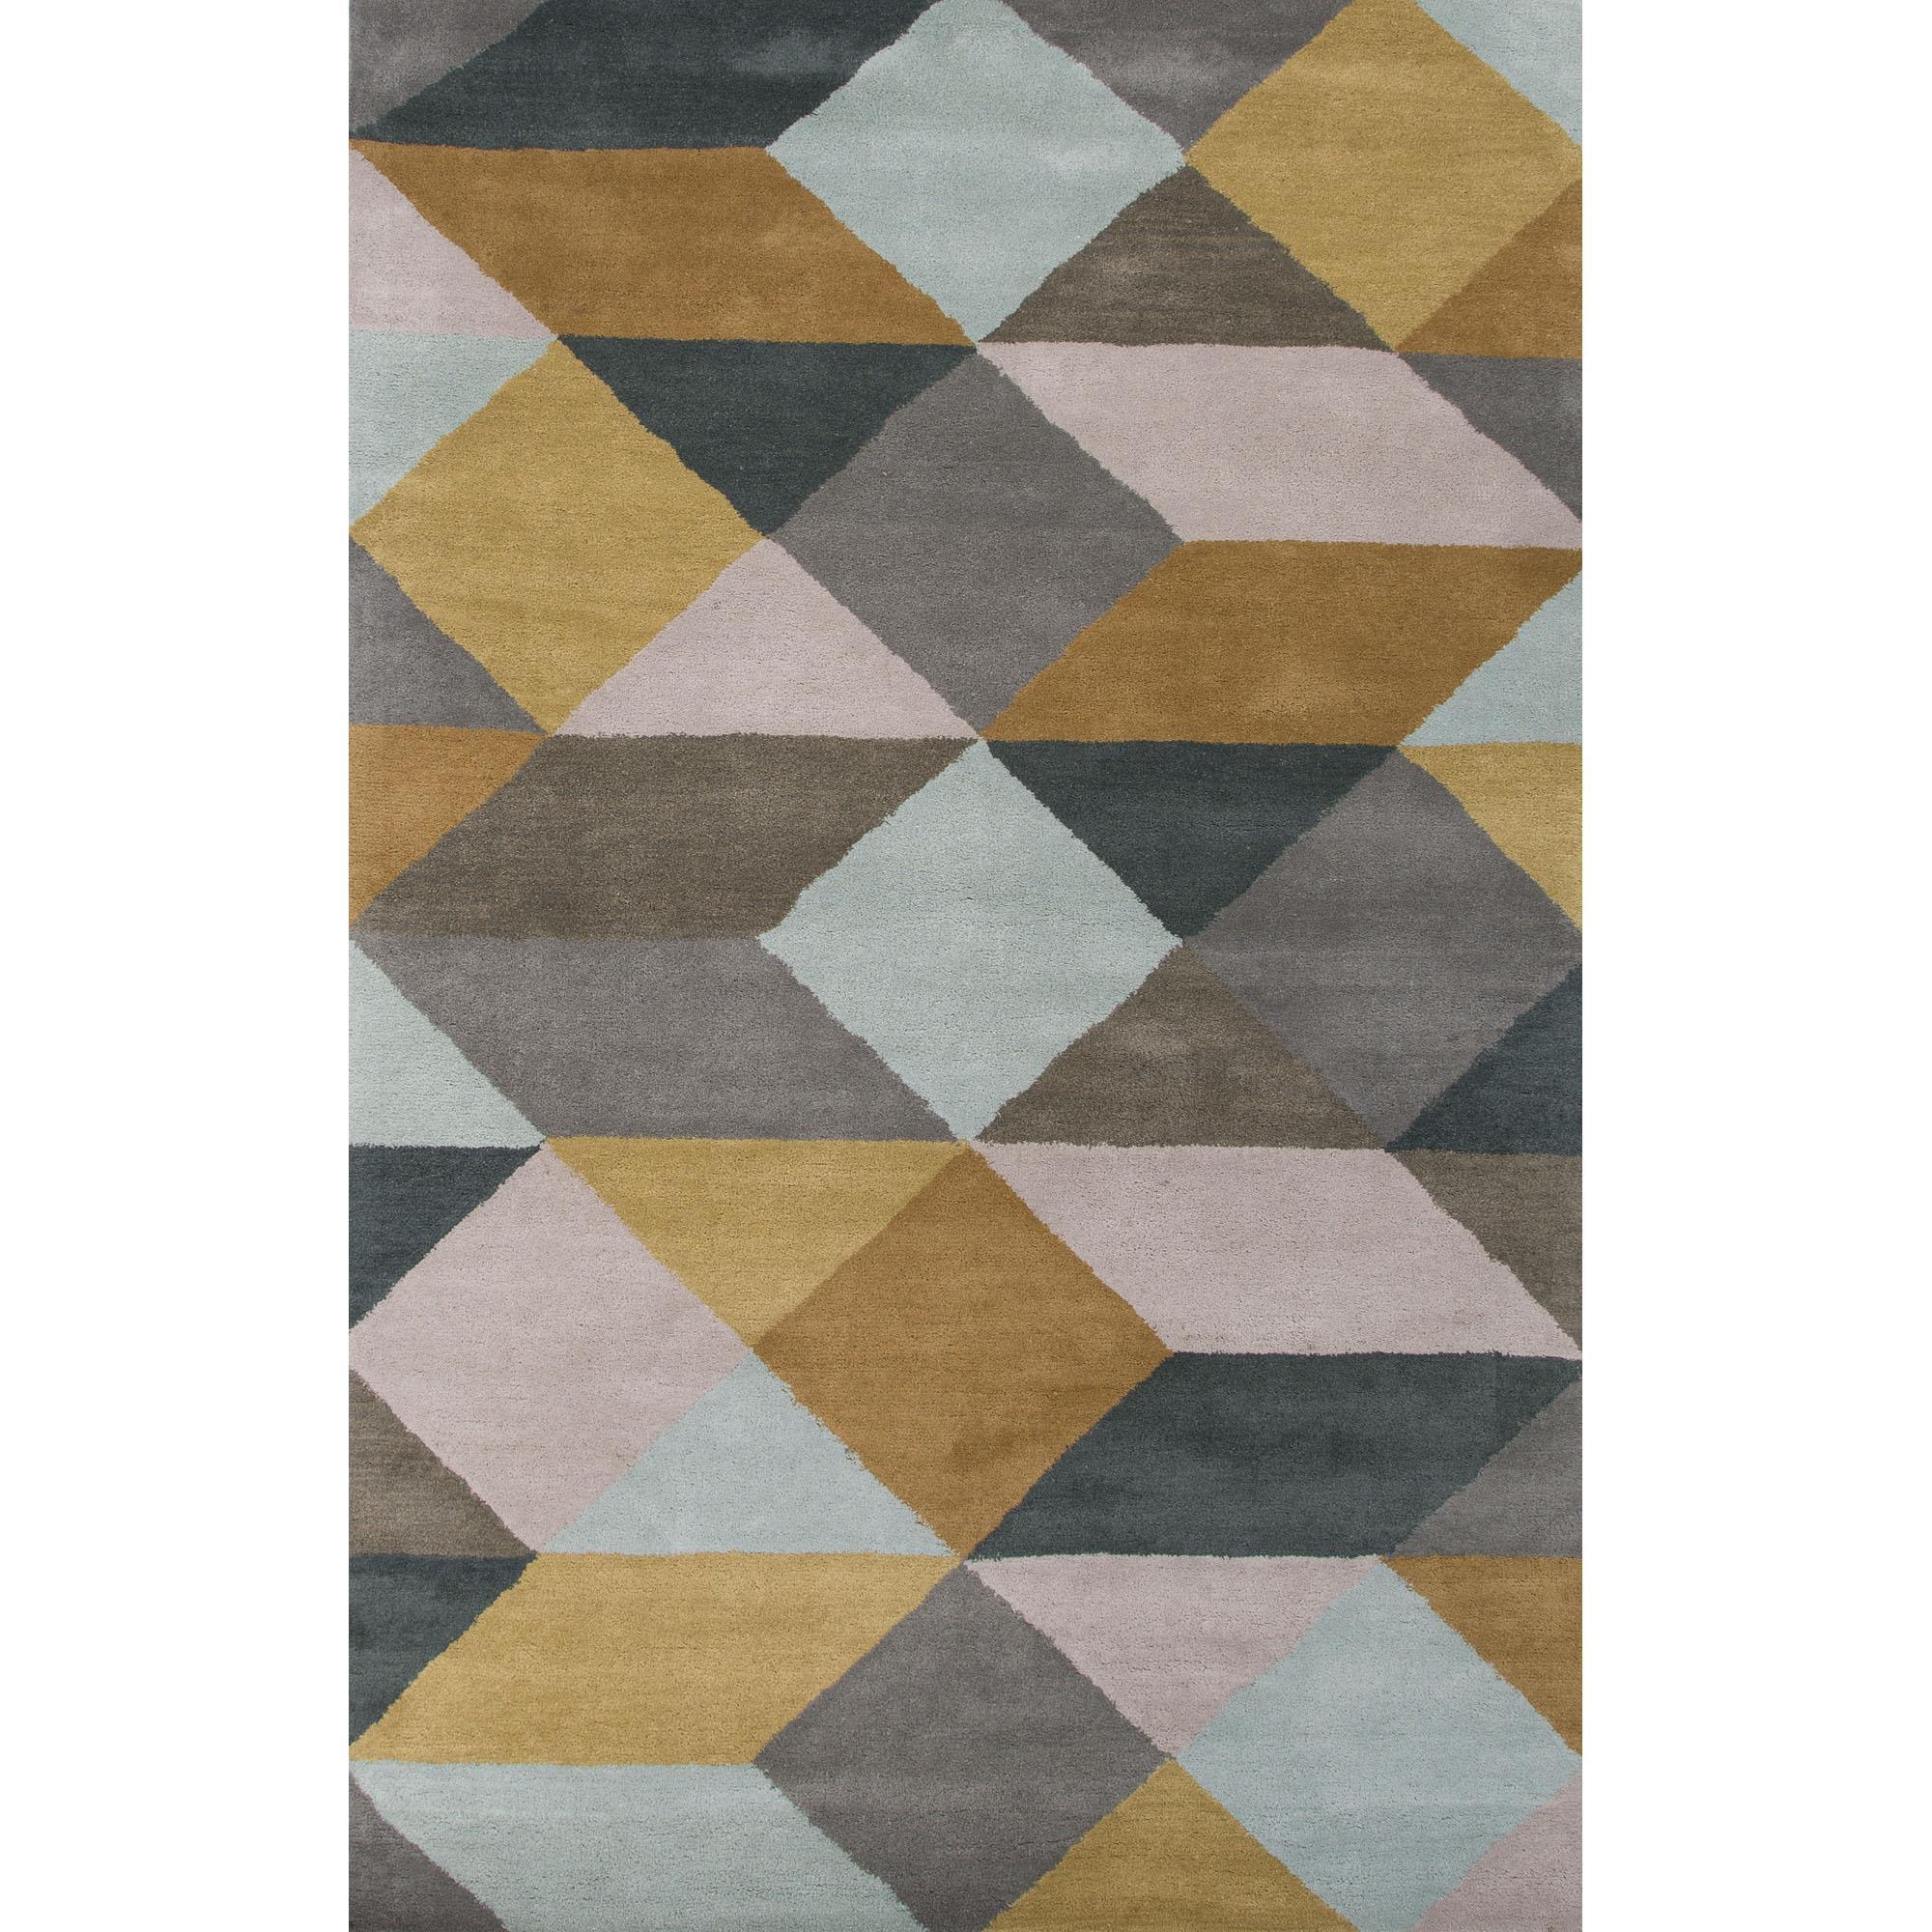 JAIPUR Rugs En Casa By Luli Sanchez Tufted 2 x 3 Rug - Item Number: RUG116794